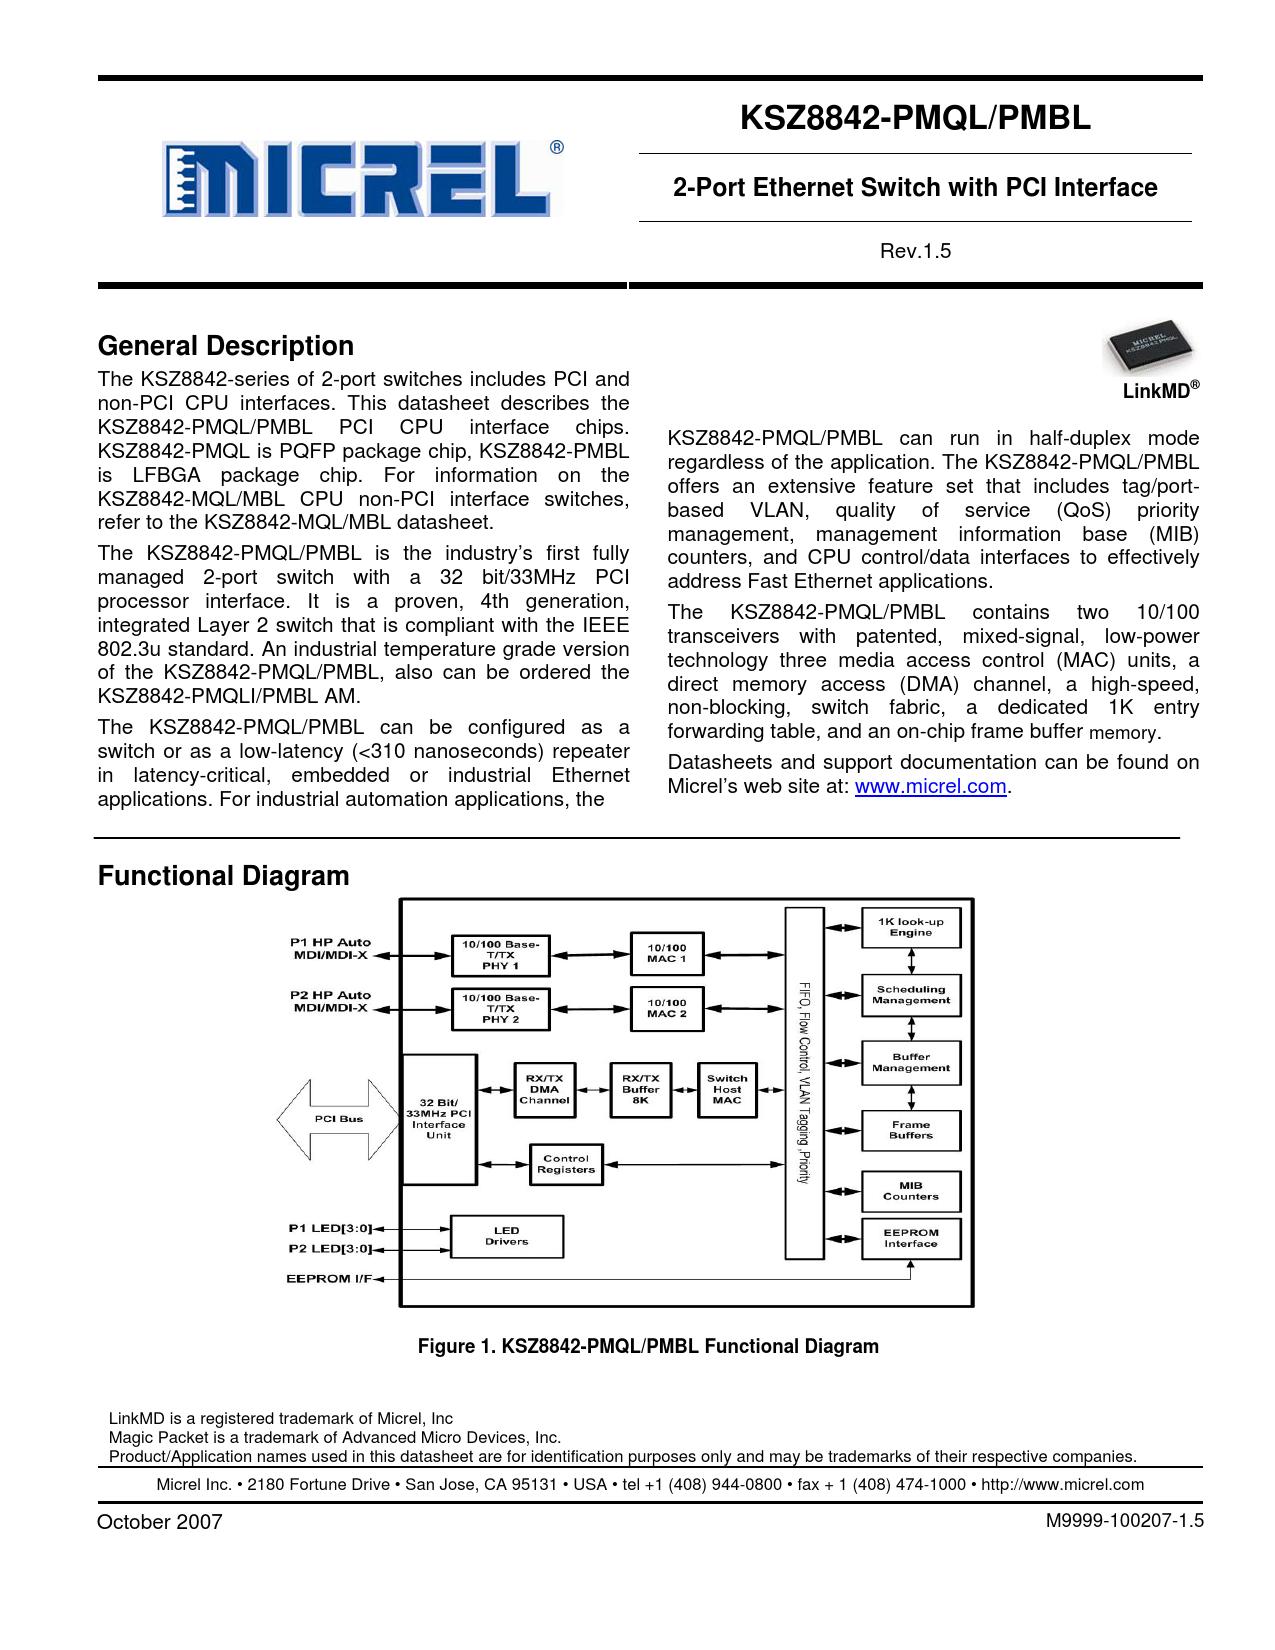 Datasheet KSZ8842-PMQL, KSZ8842-PMBL Microchip